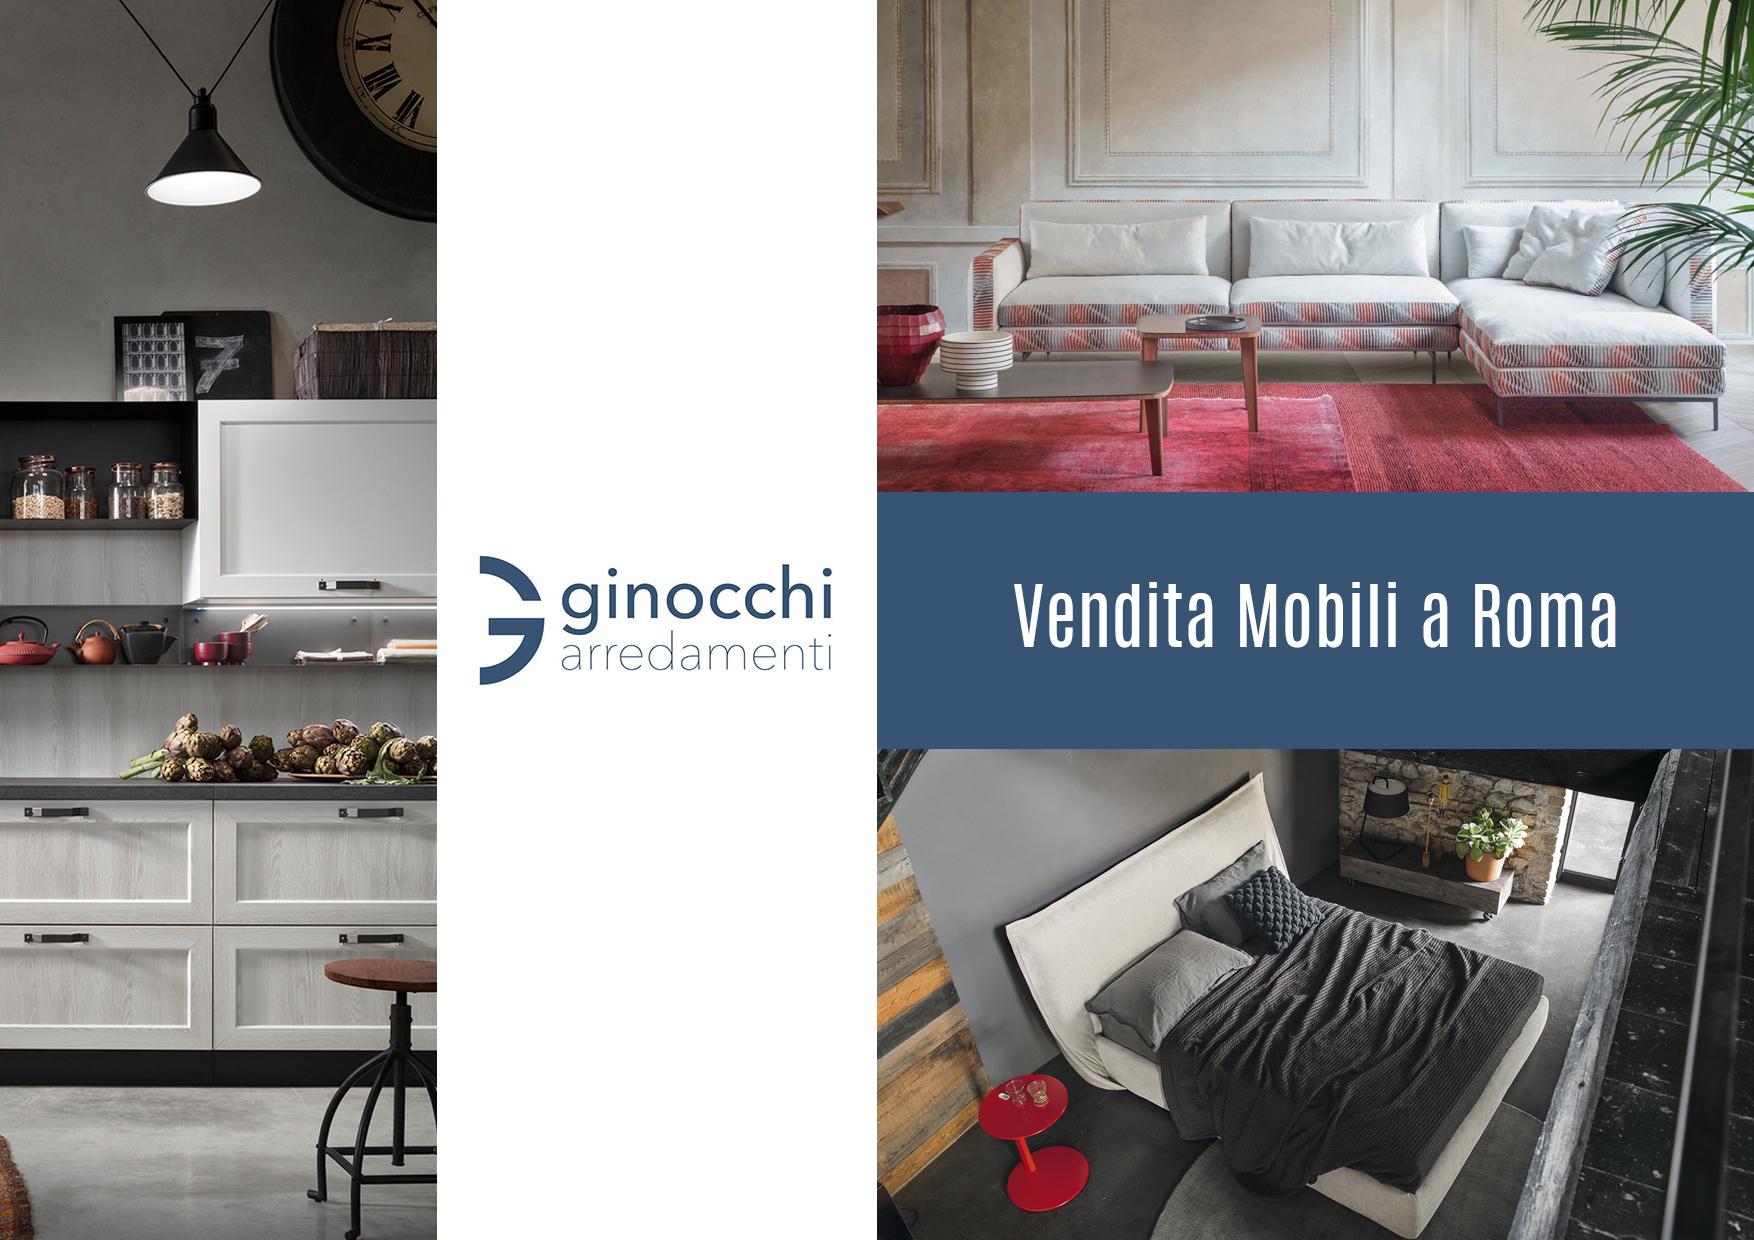 Vendita mobili a Roma